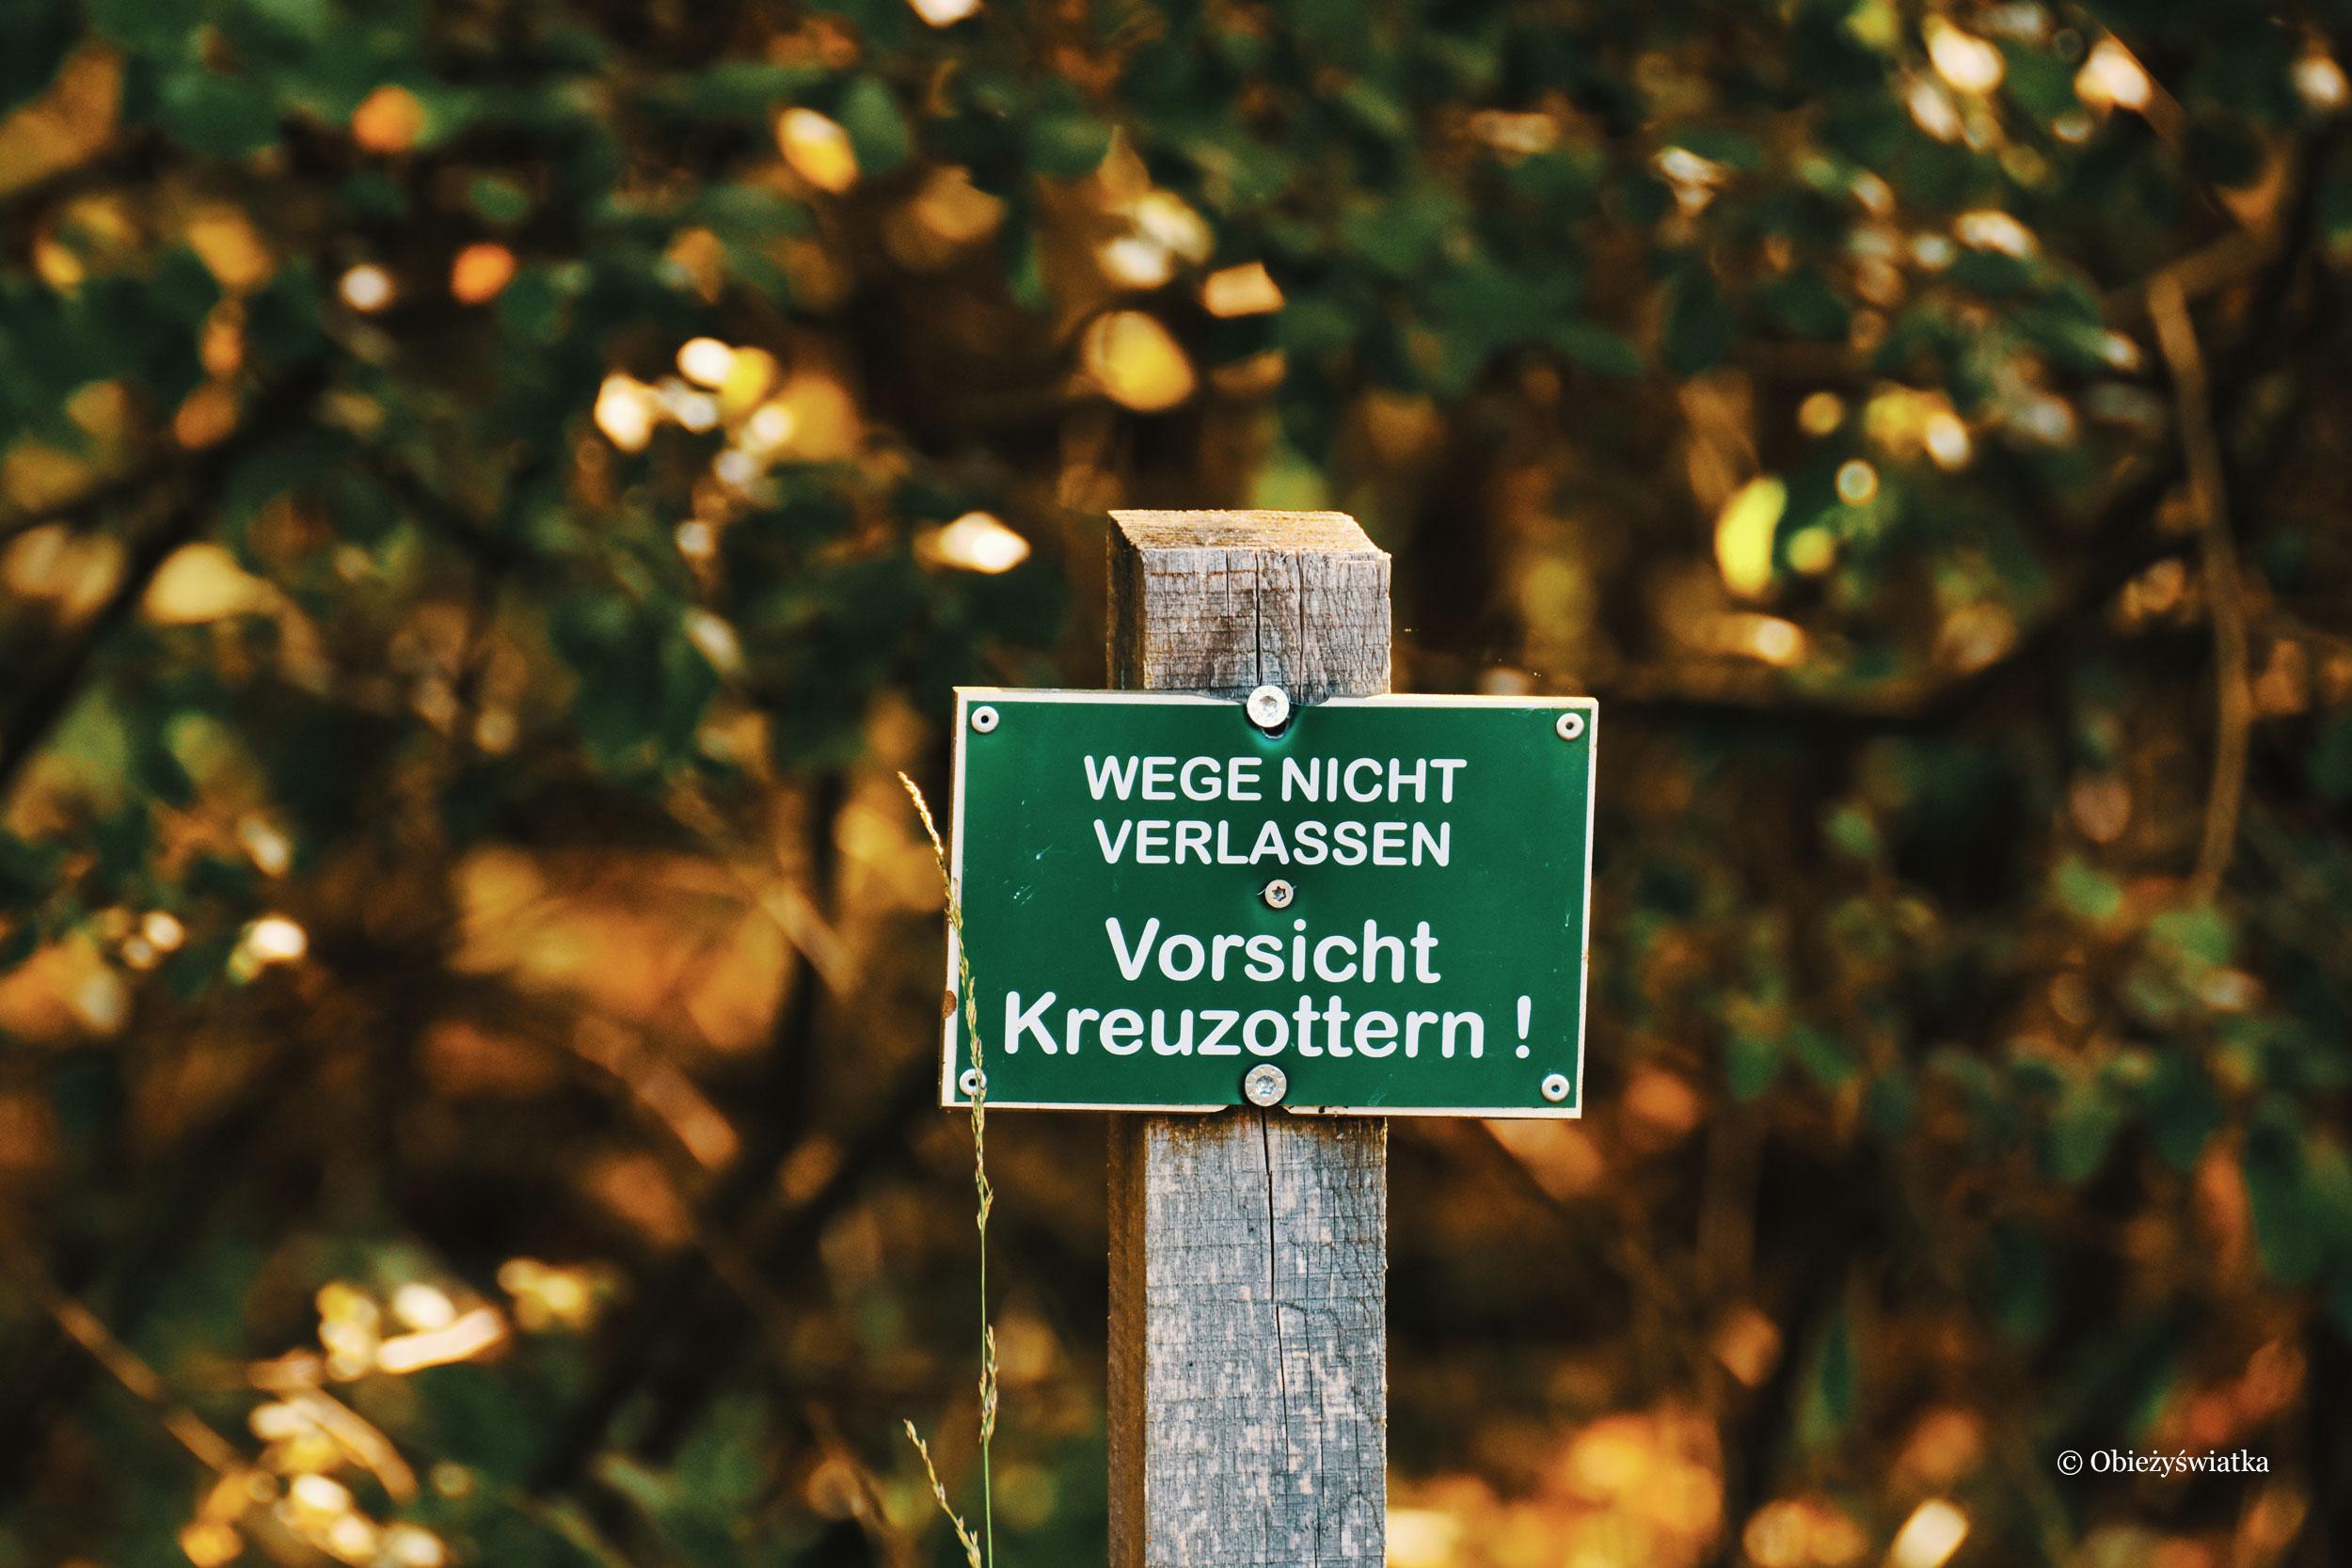 Uwaga na żmije, Lüneburger Heide